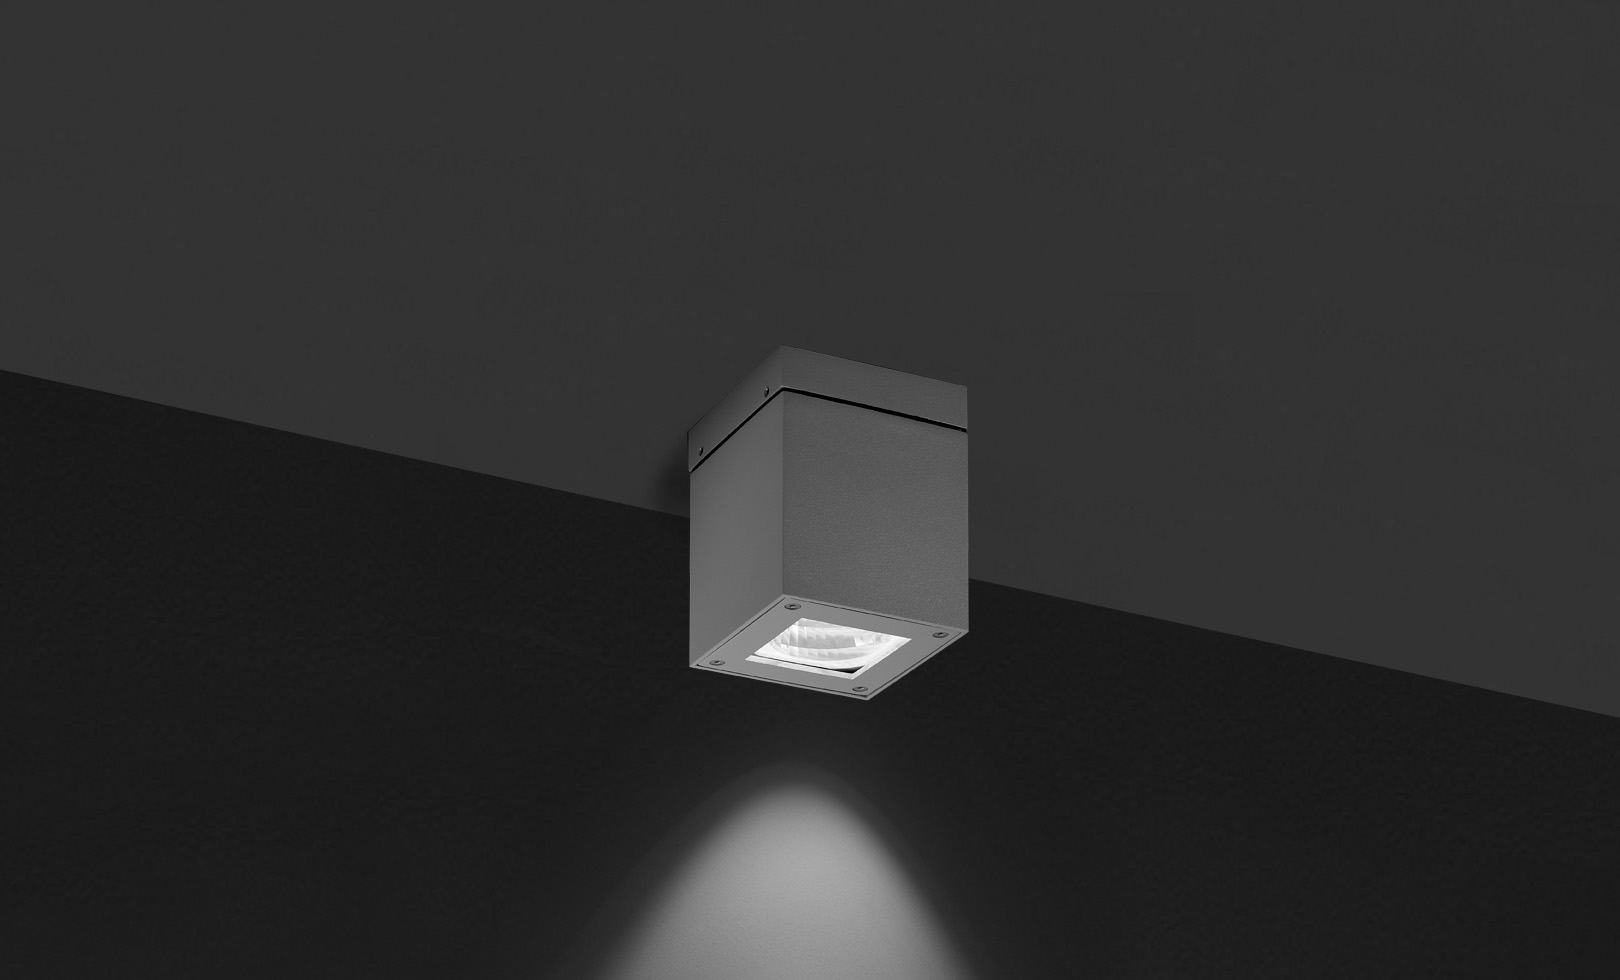 706007 TECH MEDIUM  03 SQUARE LED 26W 1